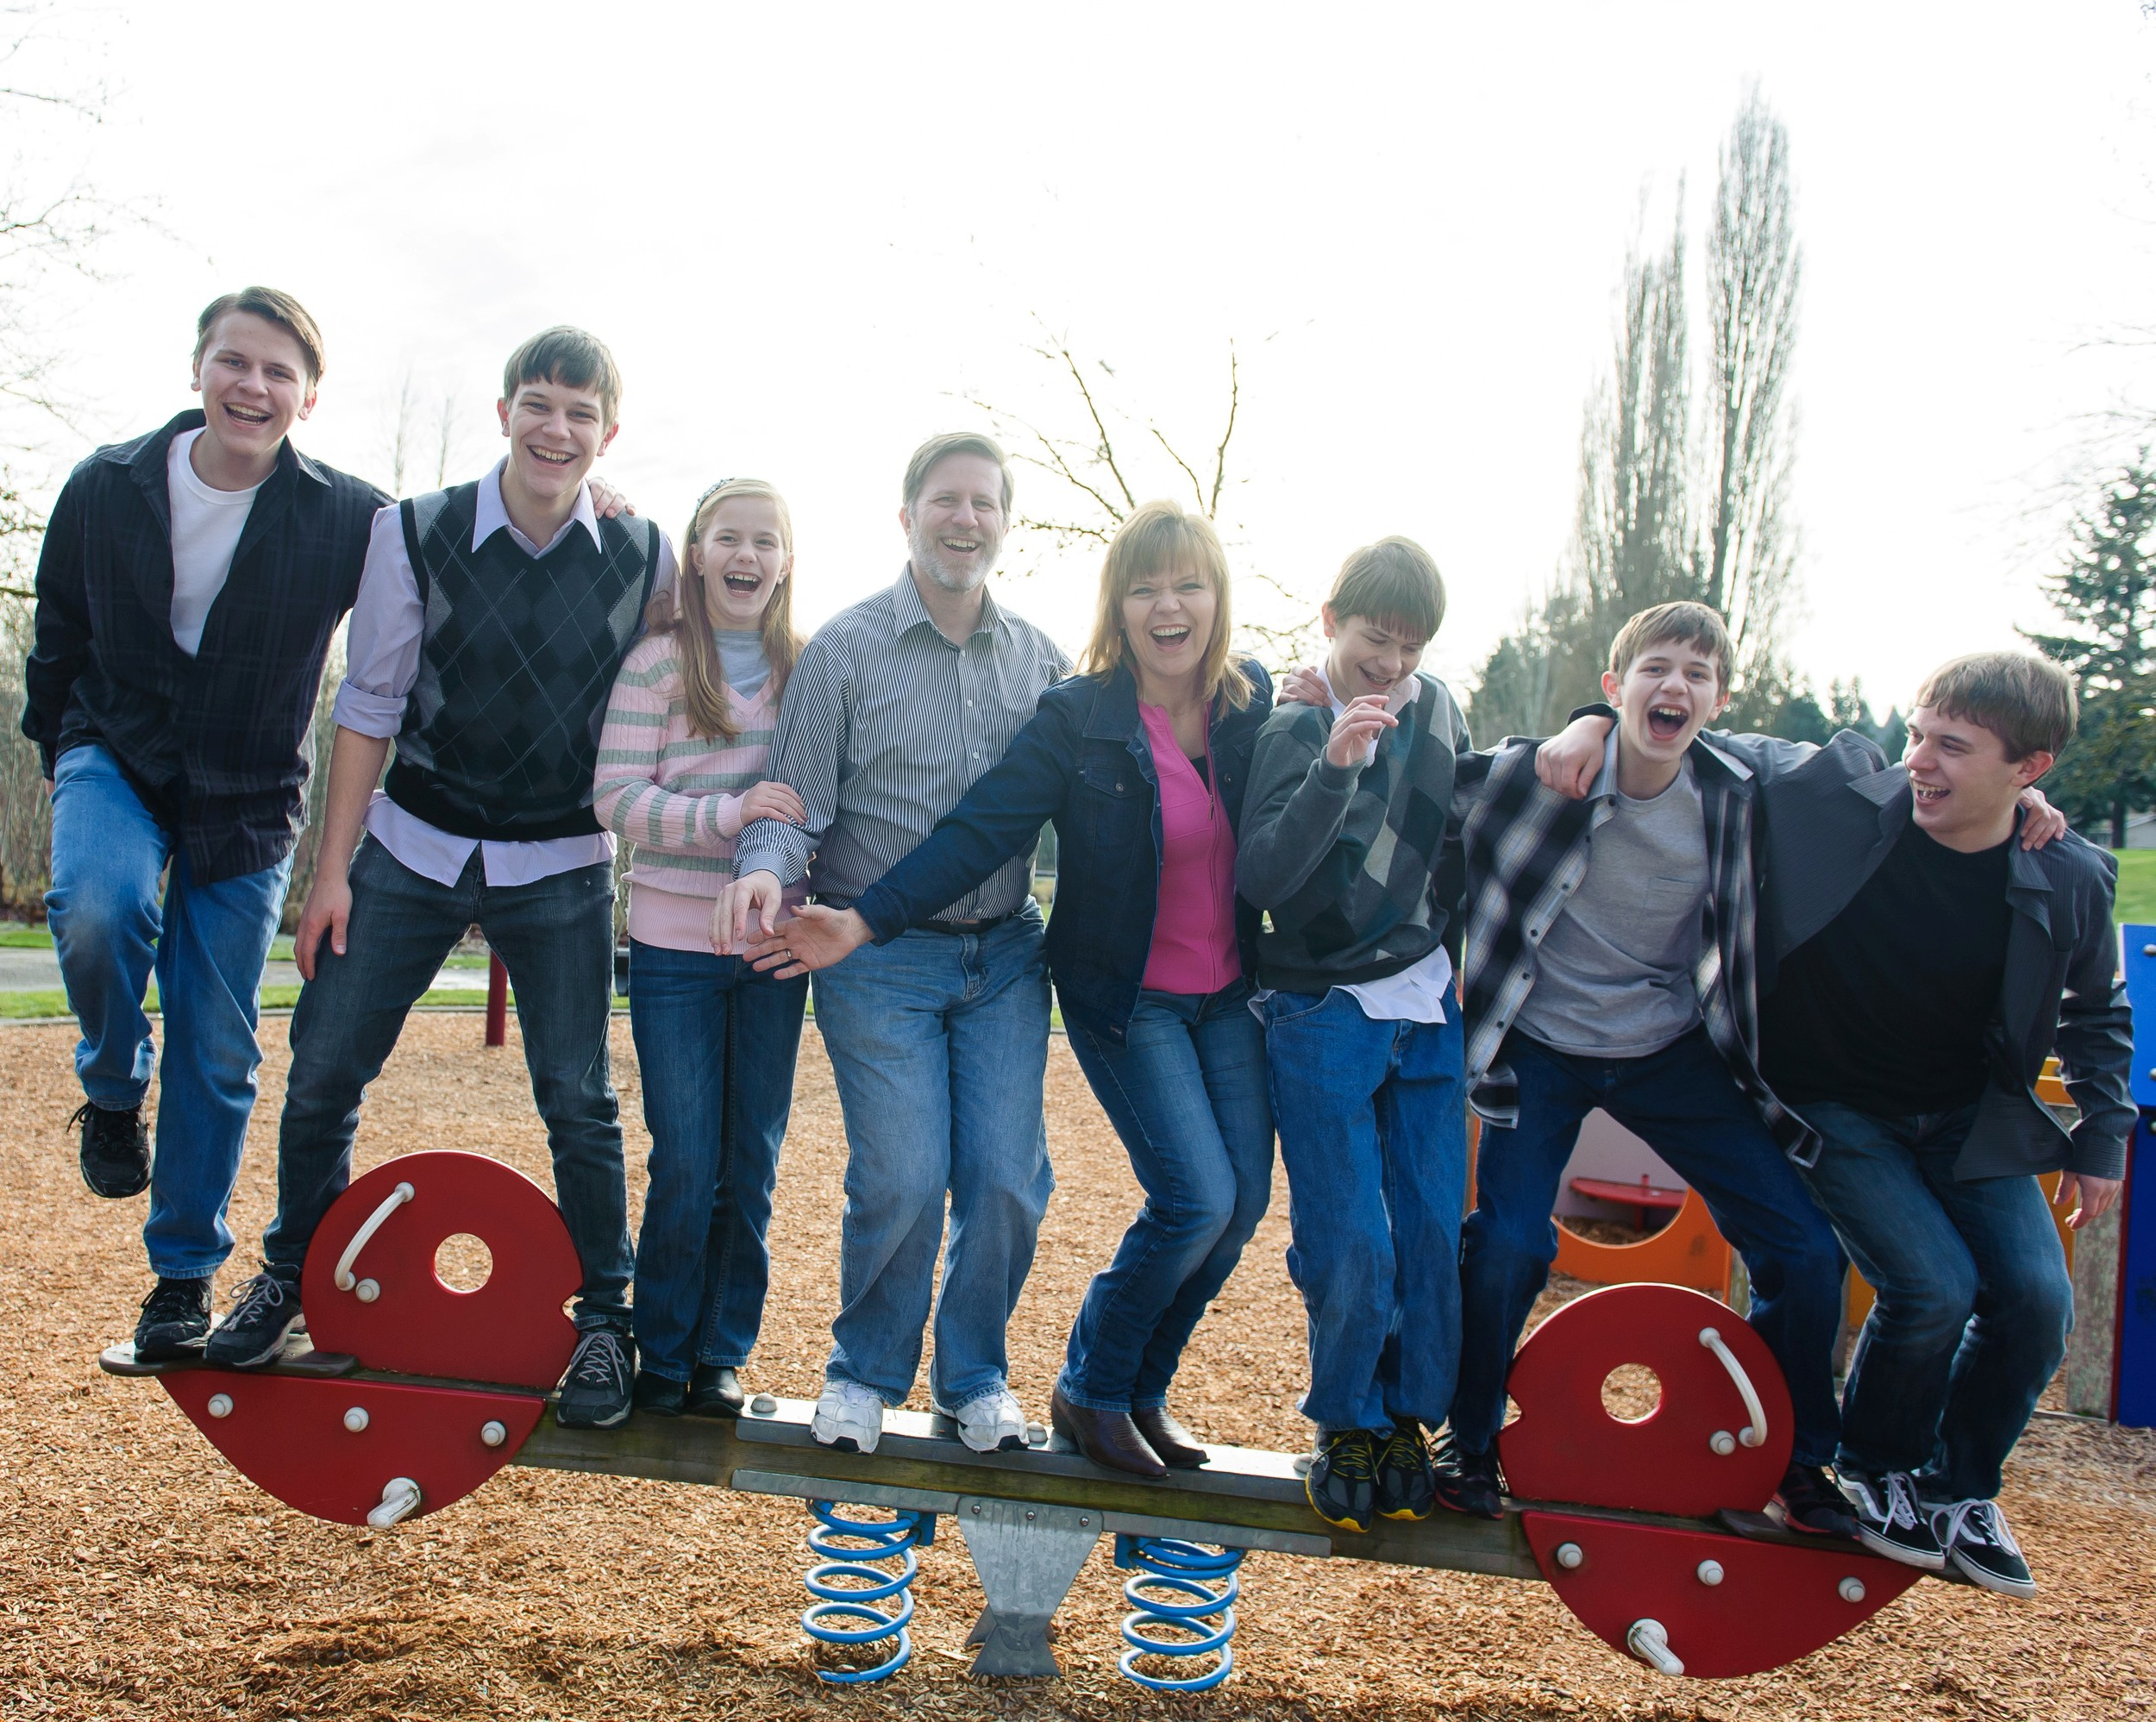 2013 Jan, Family Photo, Mike, Kray, Jessie, Steve, Doreen, Matt, Chris & Jason EDIT CROP (3).jpg